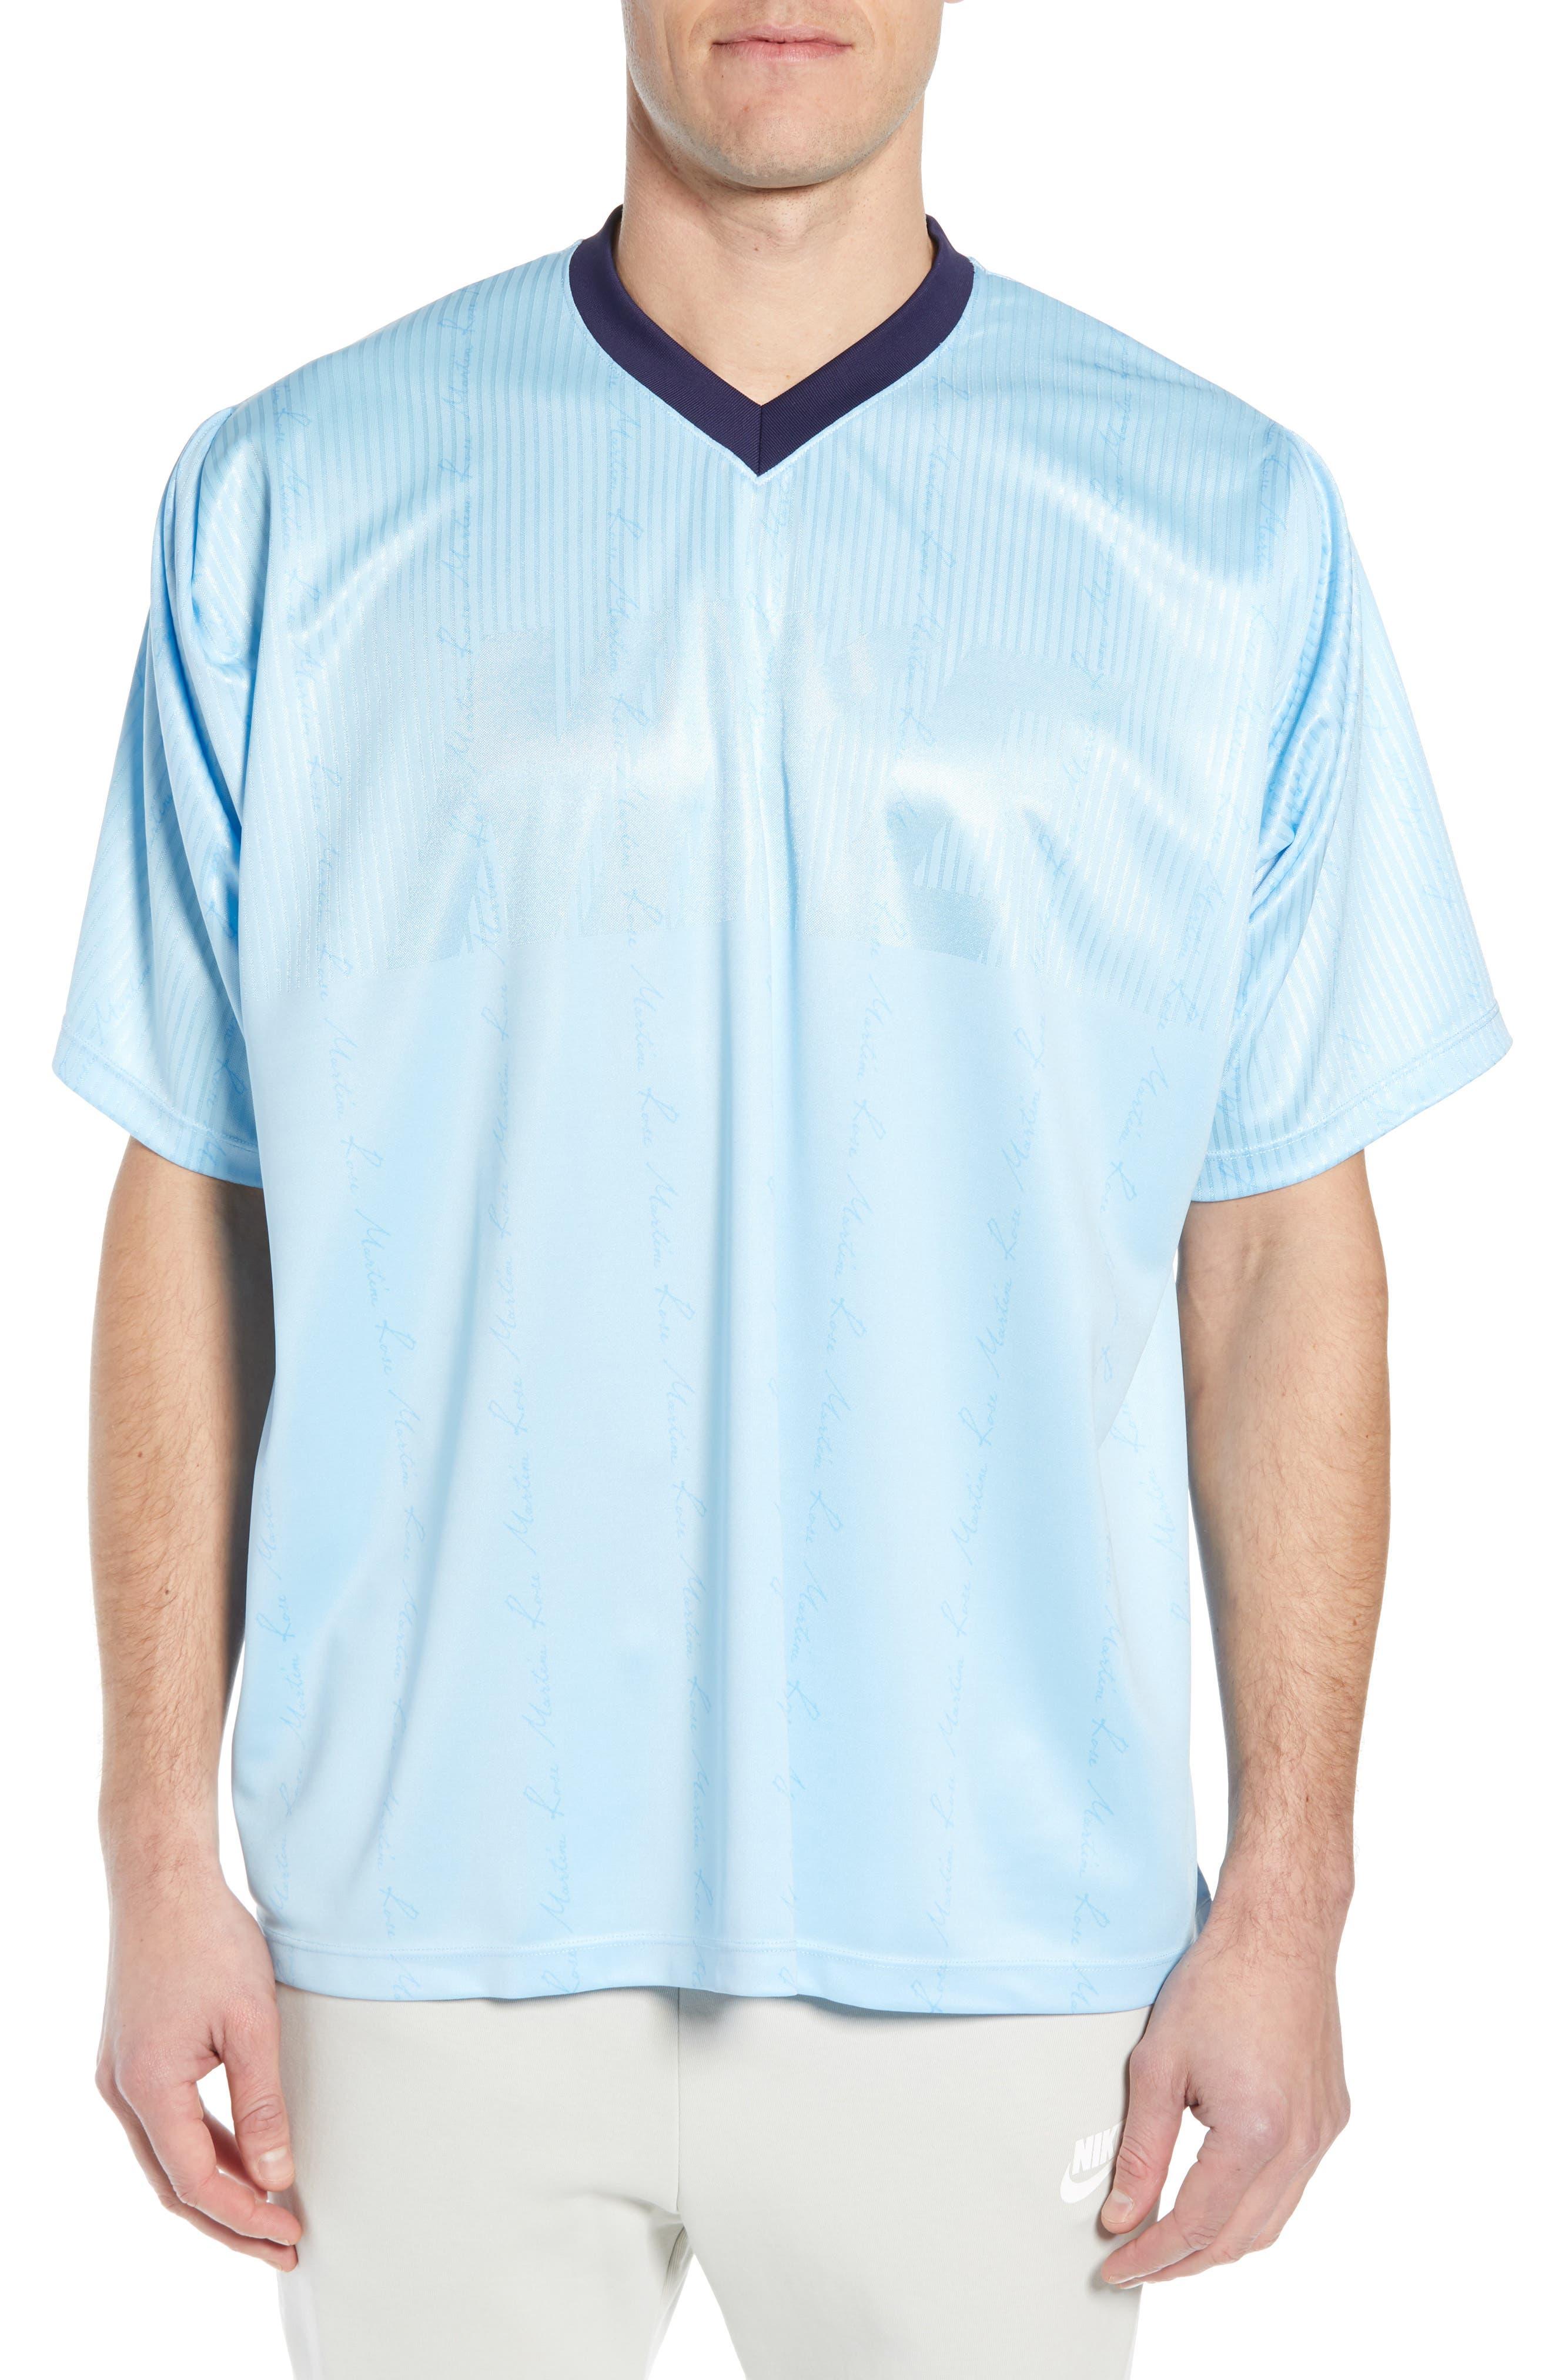 Nike Nikelab T-Shirt, Blue